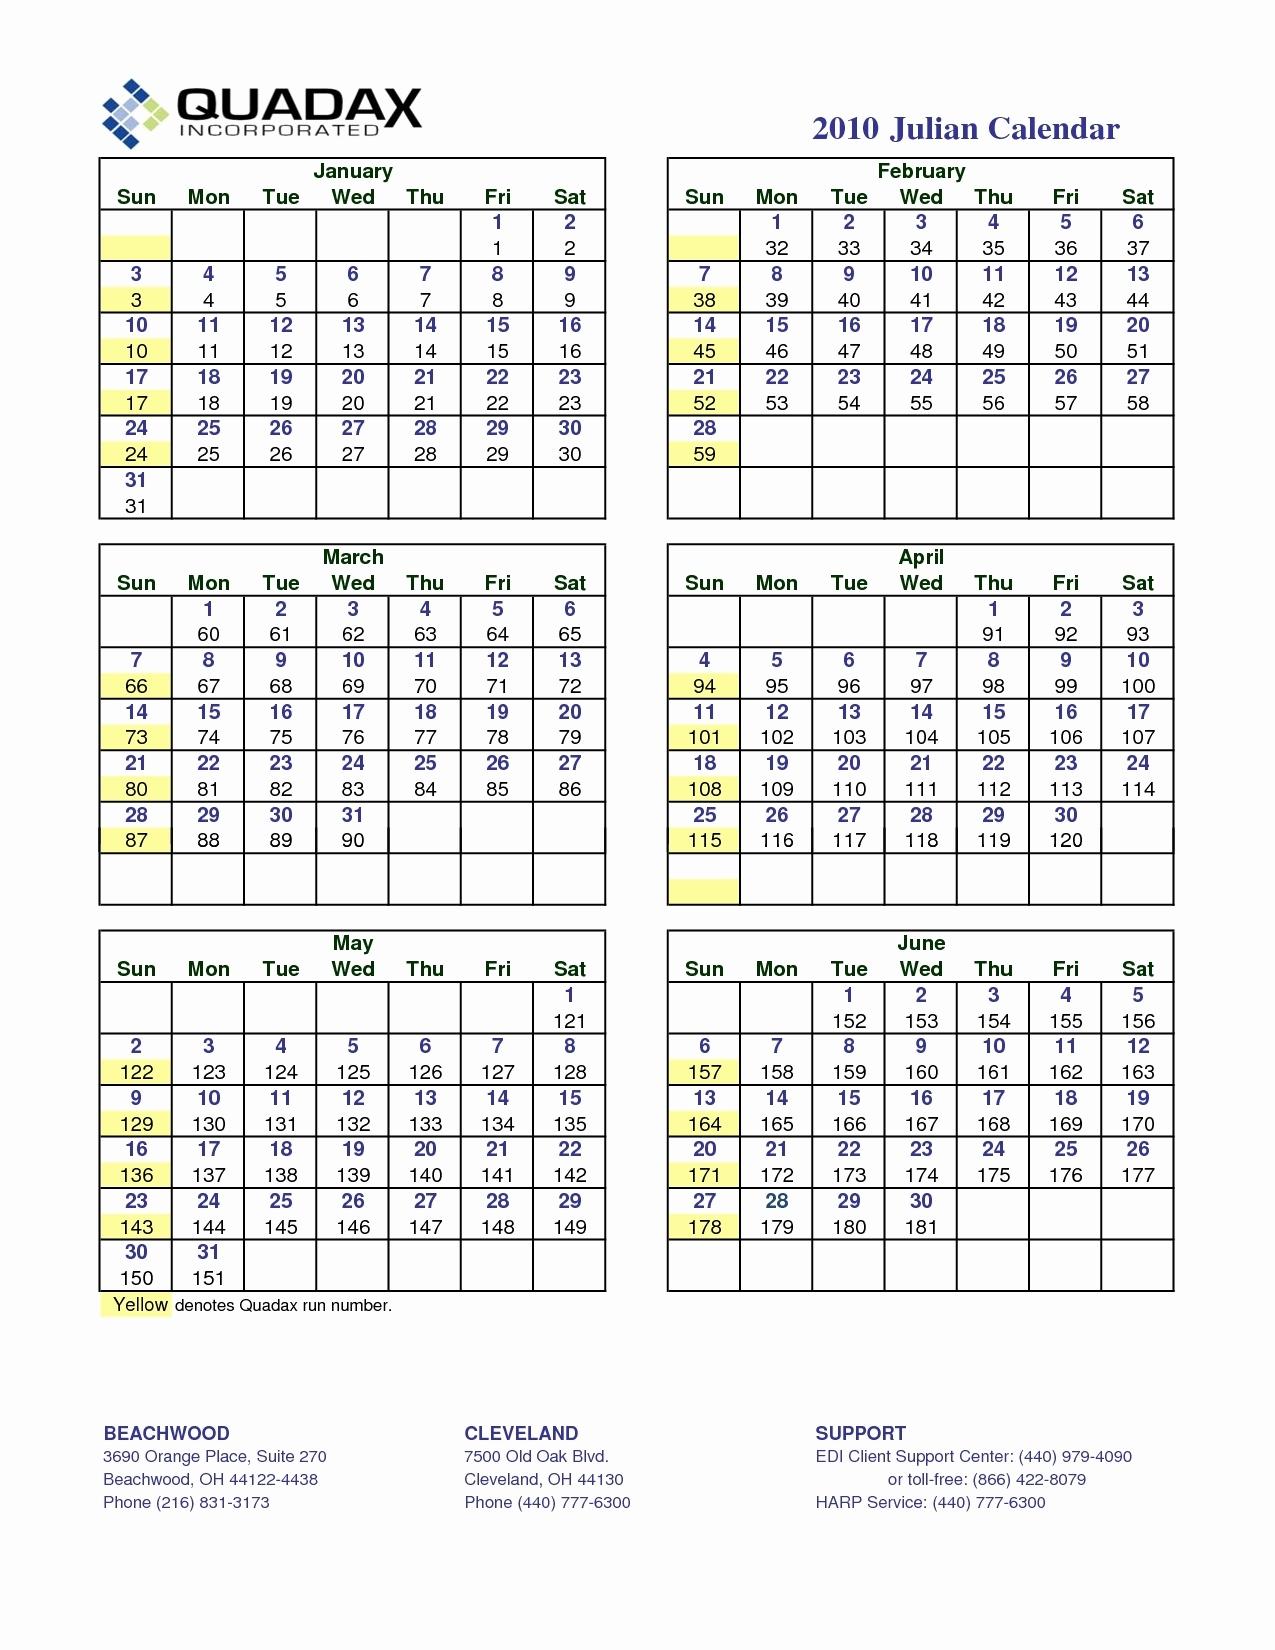 Julian Year Calendar 2015 Printable - Calendar Inspiration